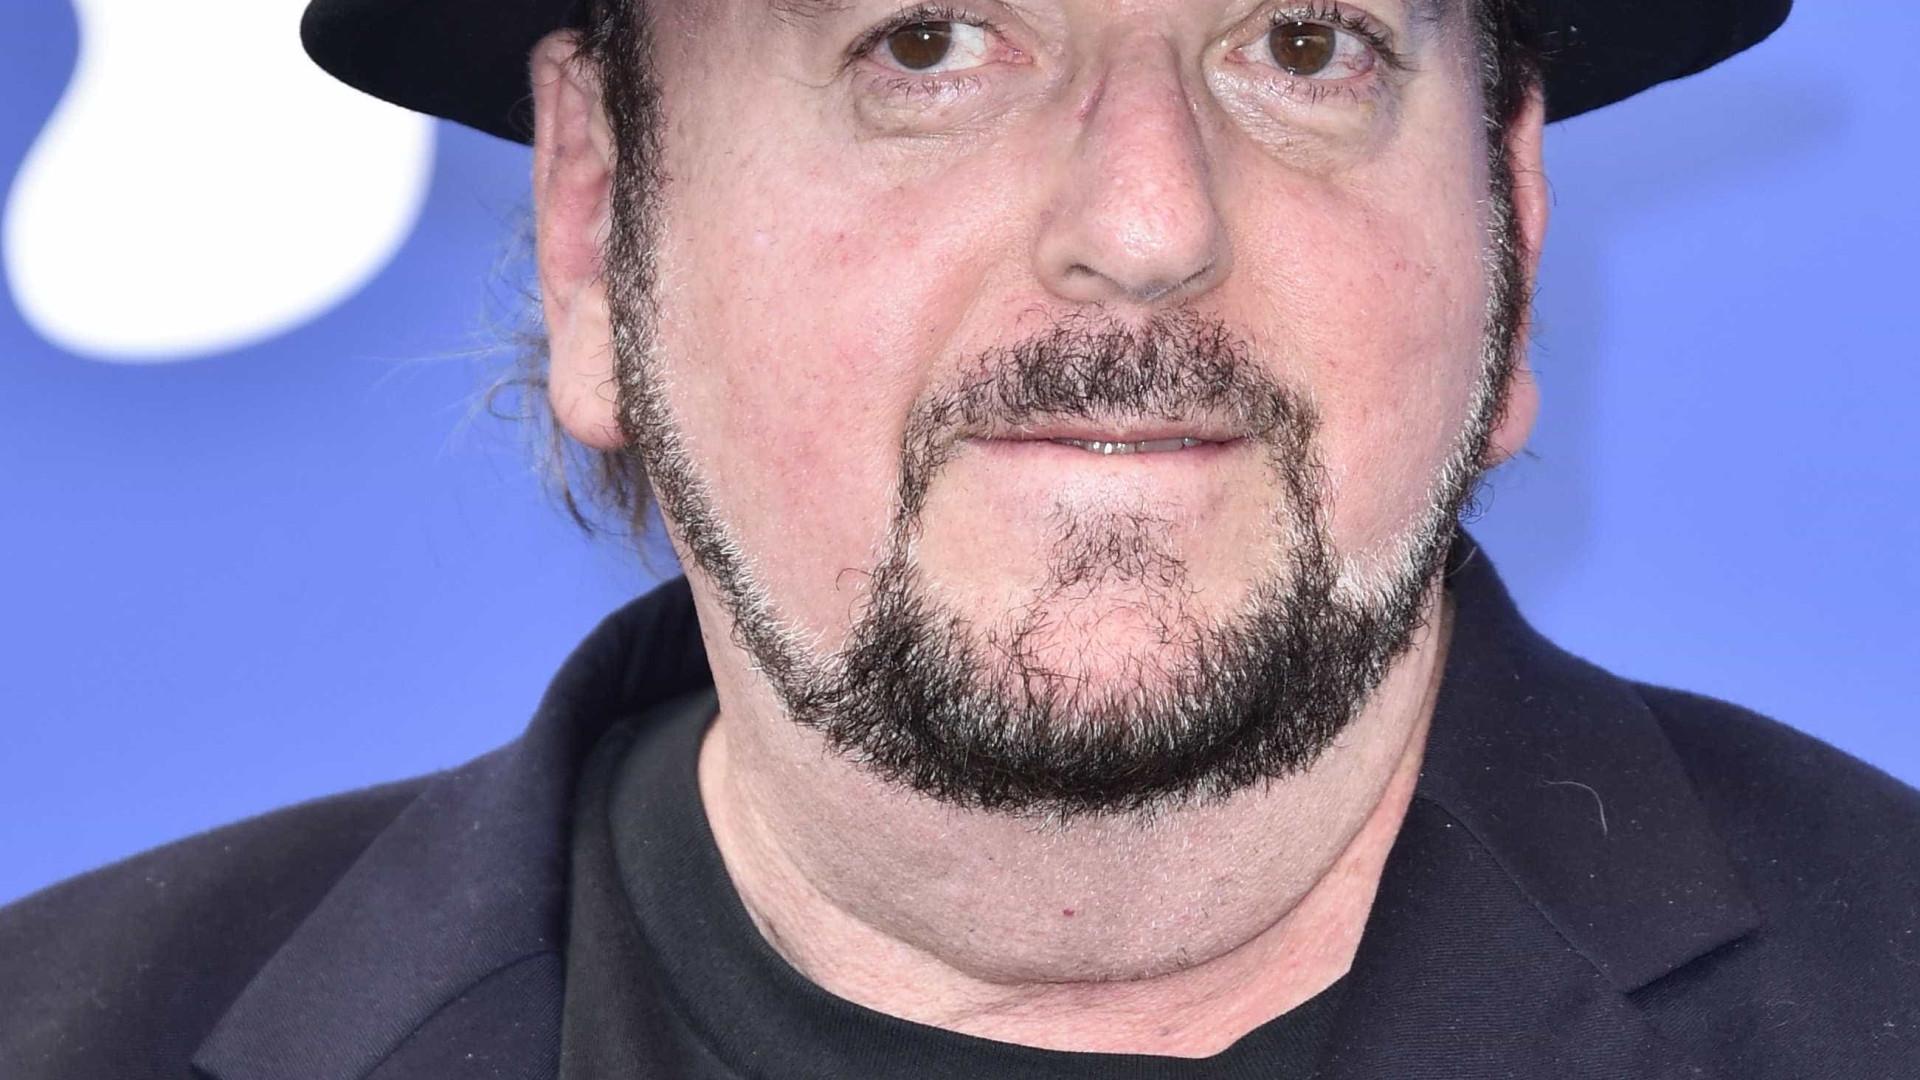 Realizador James Toback acusado de assediar sexualmente 38 mulheres